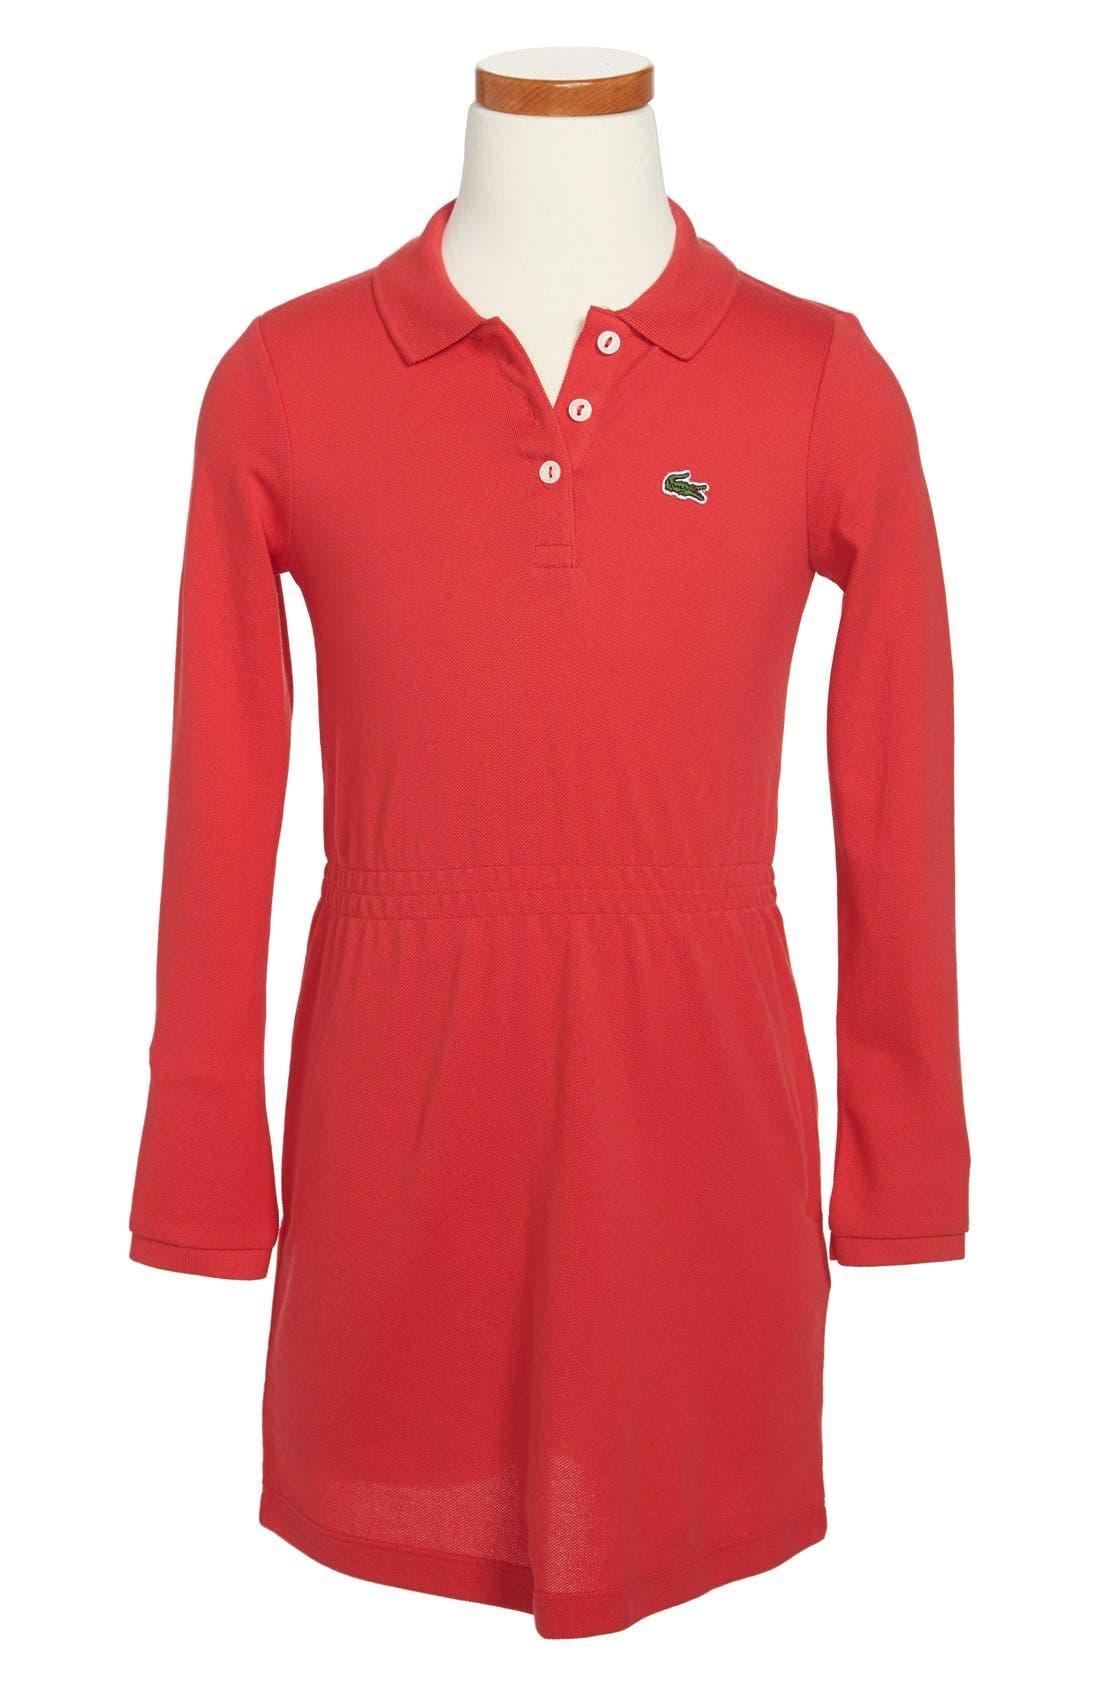 Alternate Image 1 Selected - Lacoste Piqué Polo Dress (Toddler Girls & Little Girls)